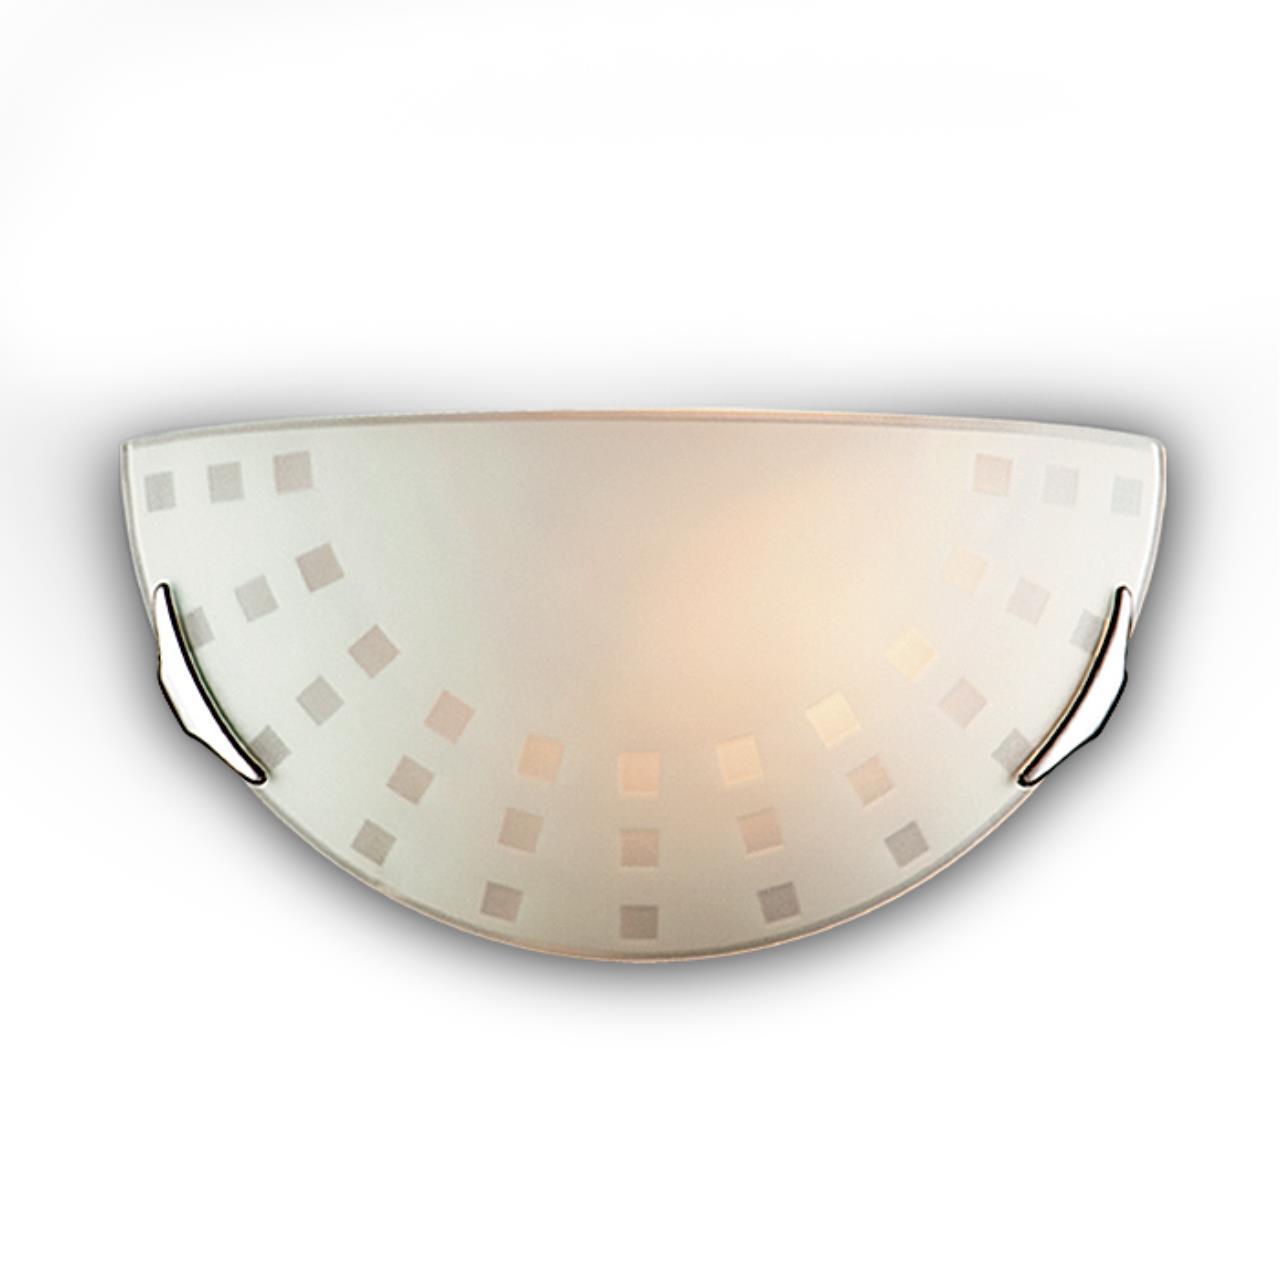 062 SN 103 бра QUADRO WHITE стекло E27 1*100Вт 300х160